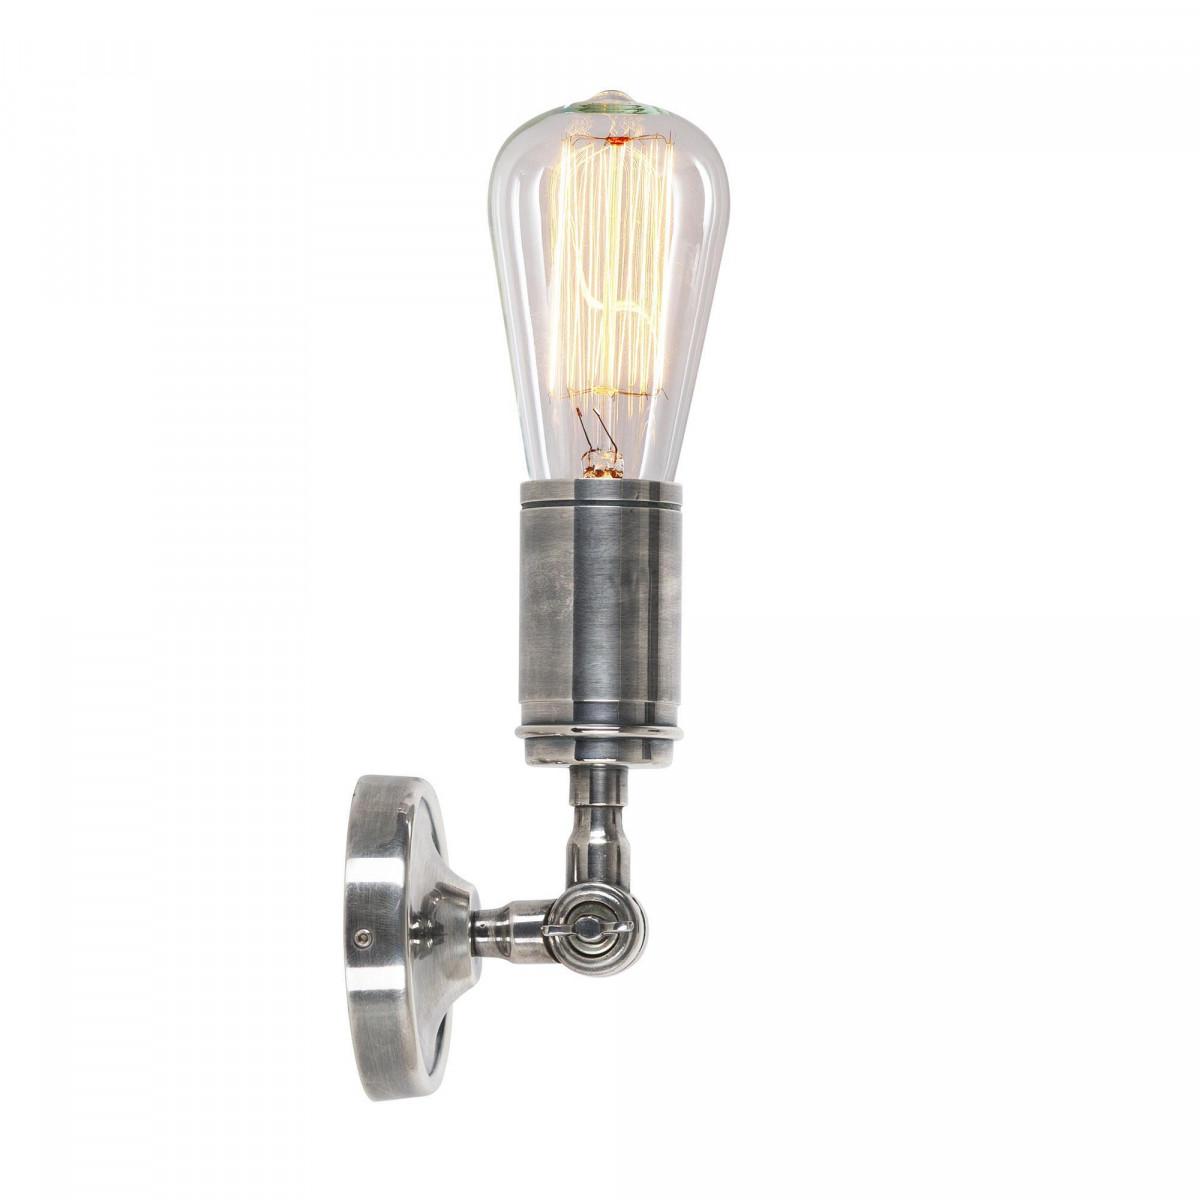 Plafondlamp Spot Emeli antiek zilver